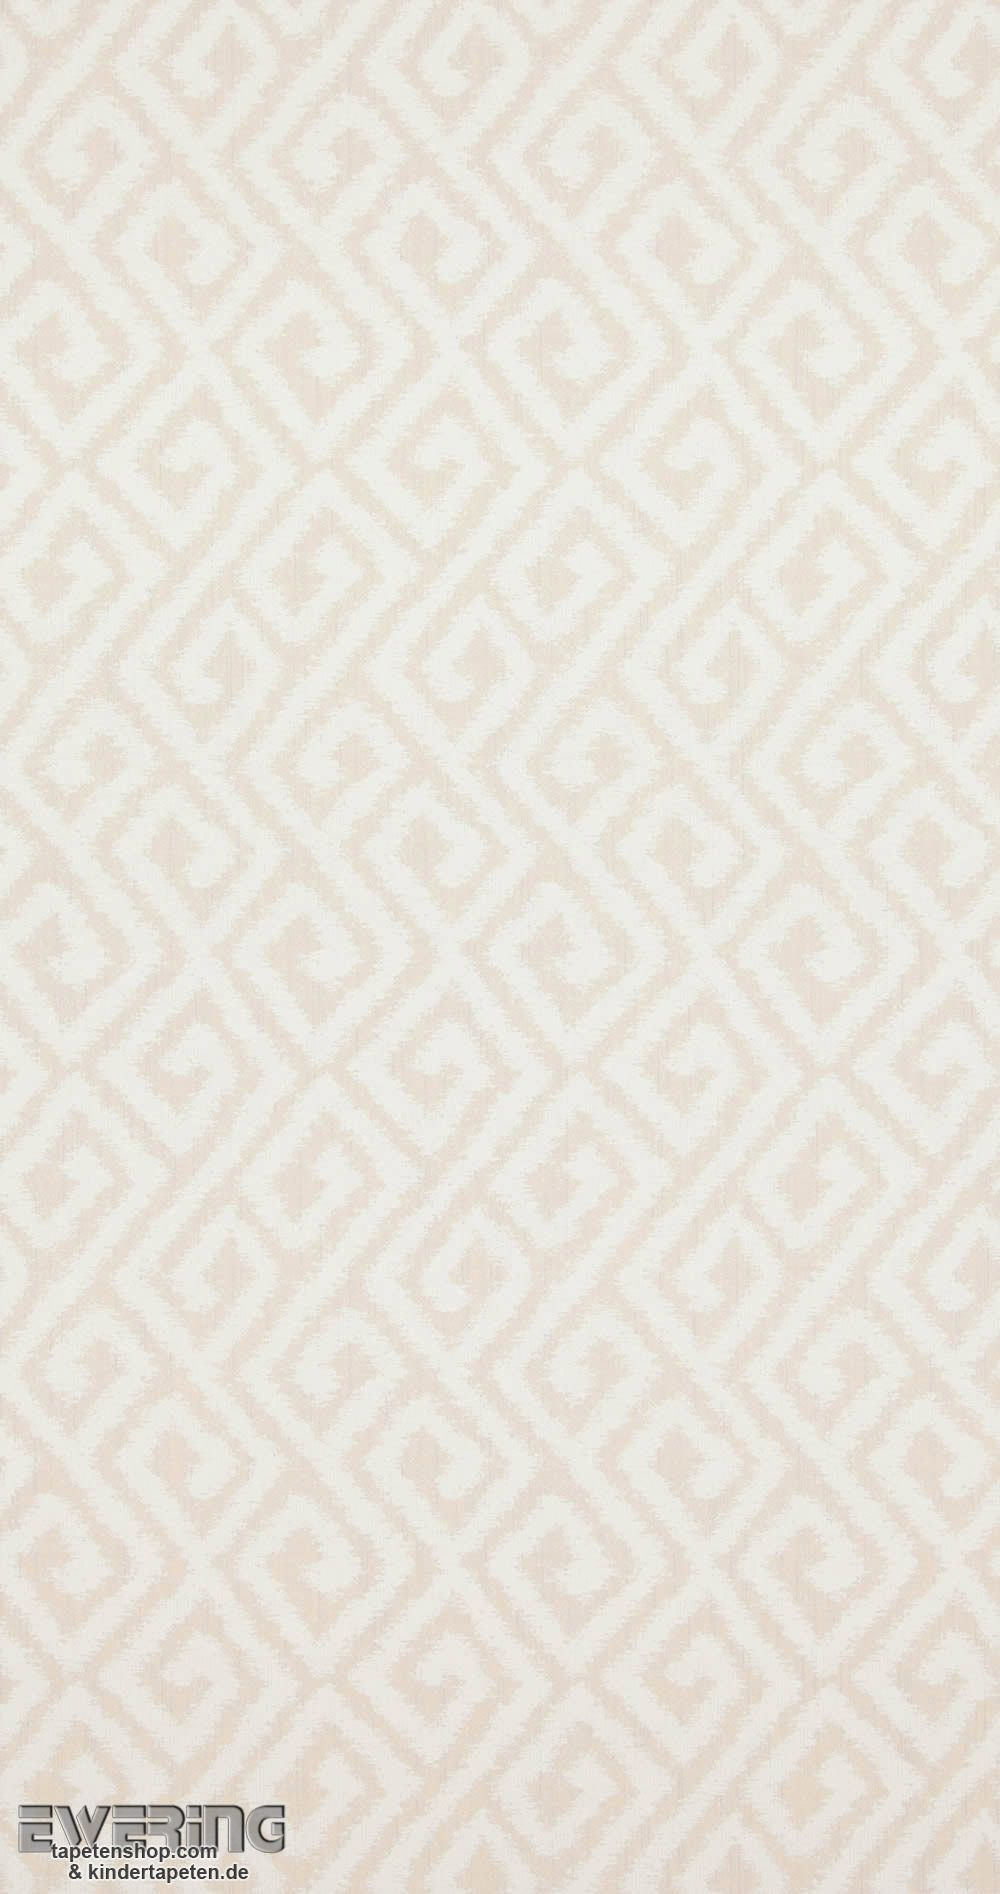 bn tapeten nomadics 12 17261 beige vliestapete graphisches muster graphic patterns. Black Bedroom Furniture Sets. Home Design Ideas